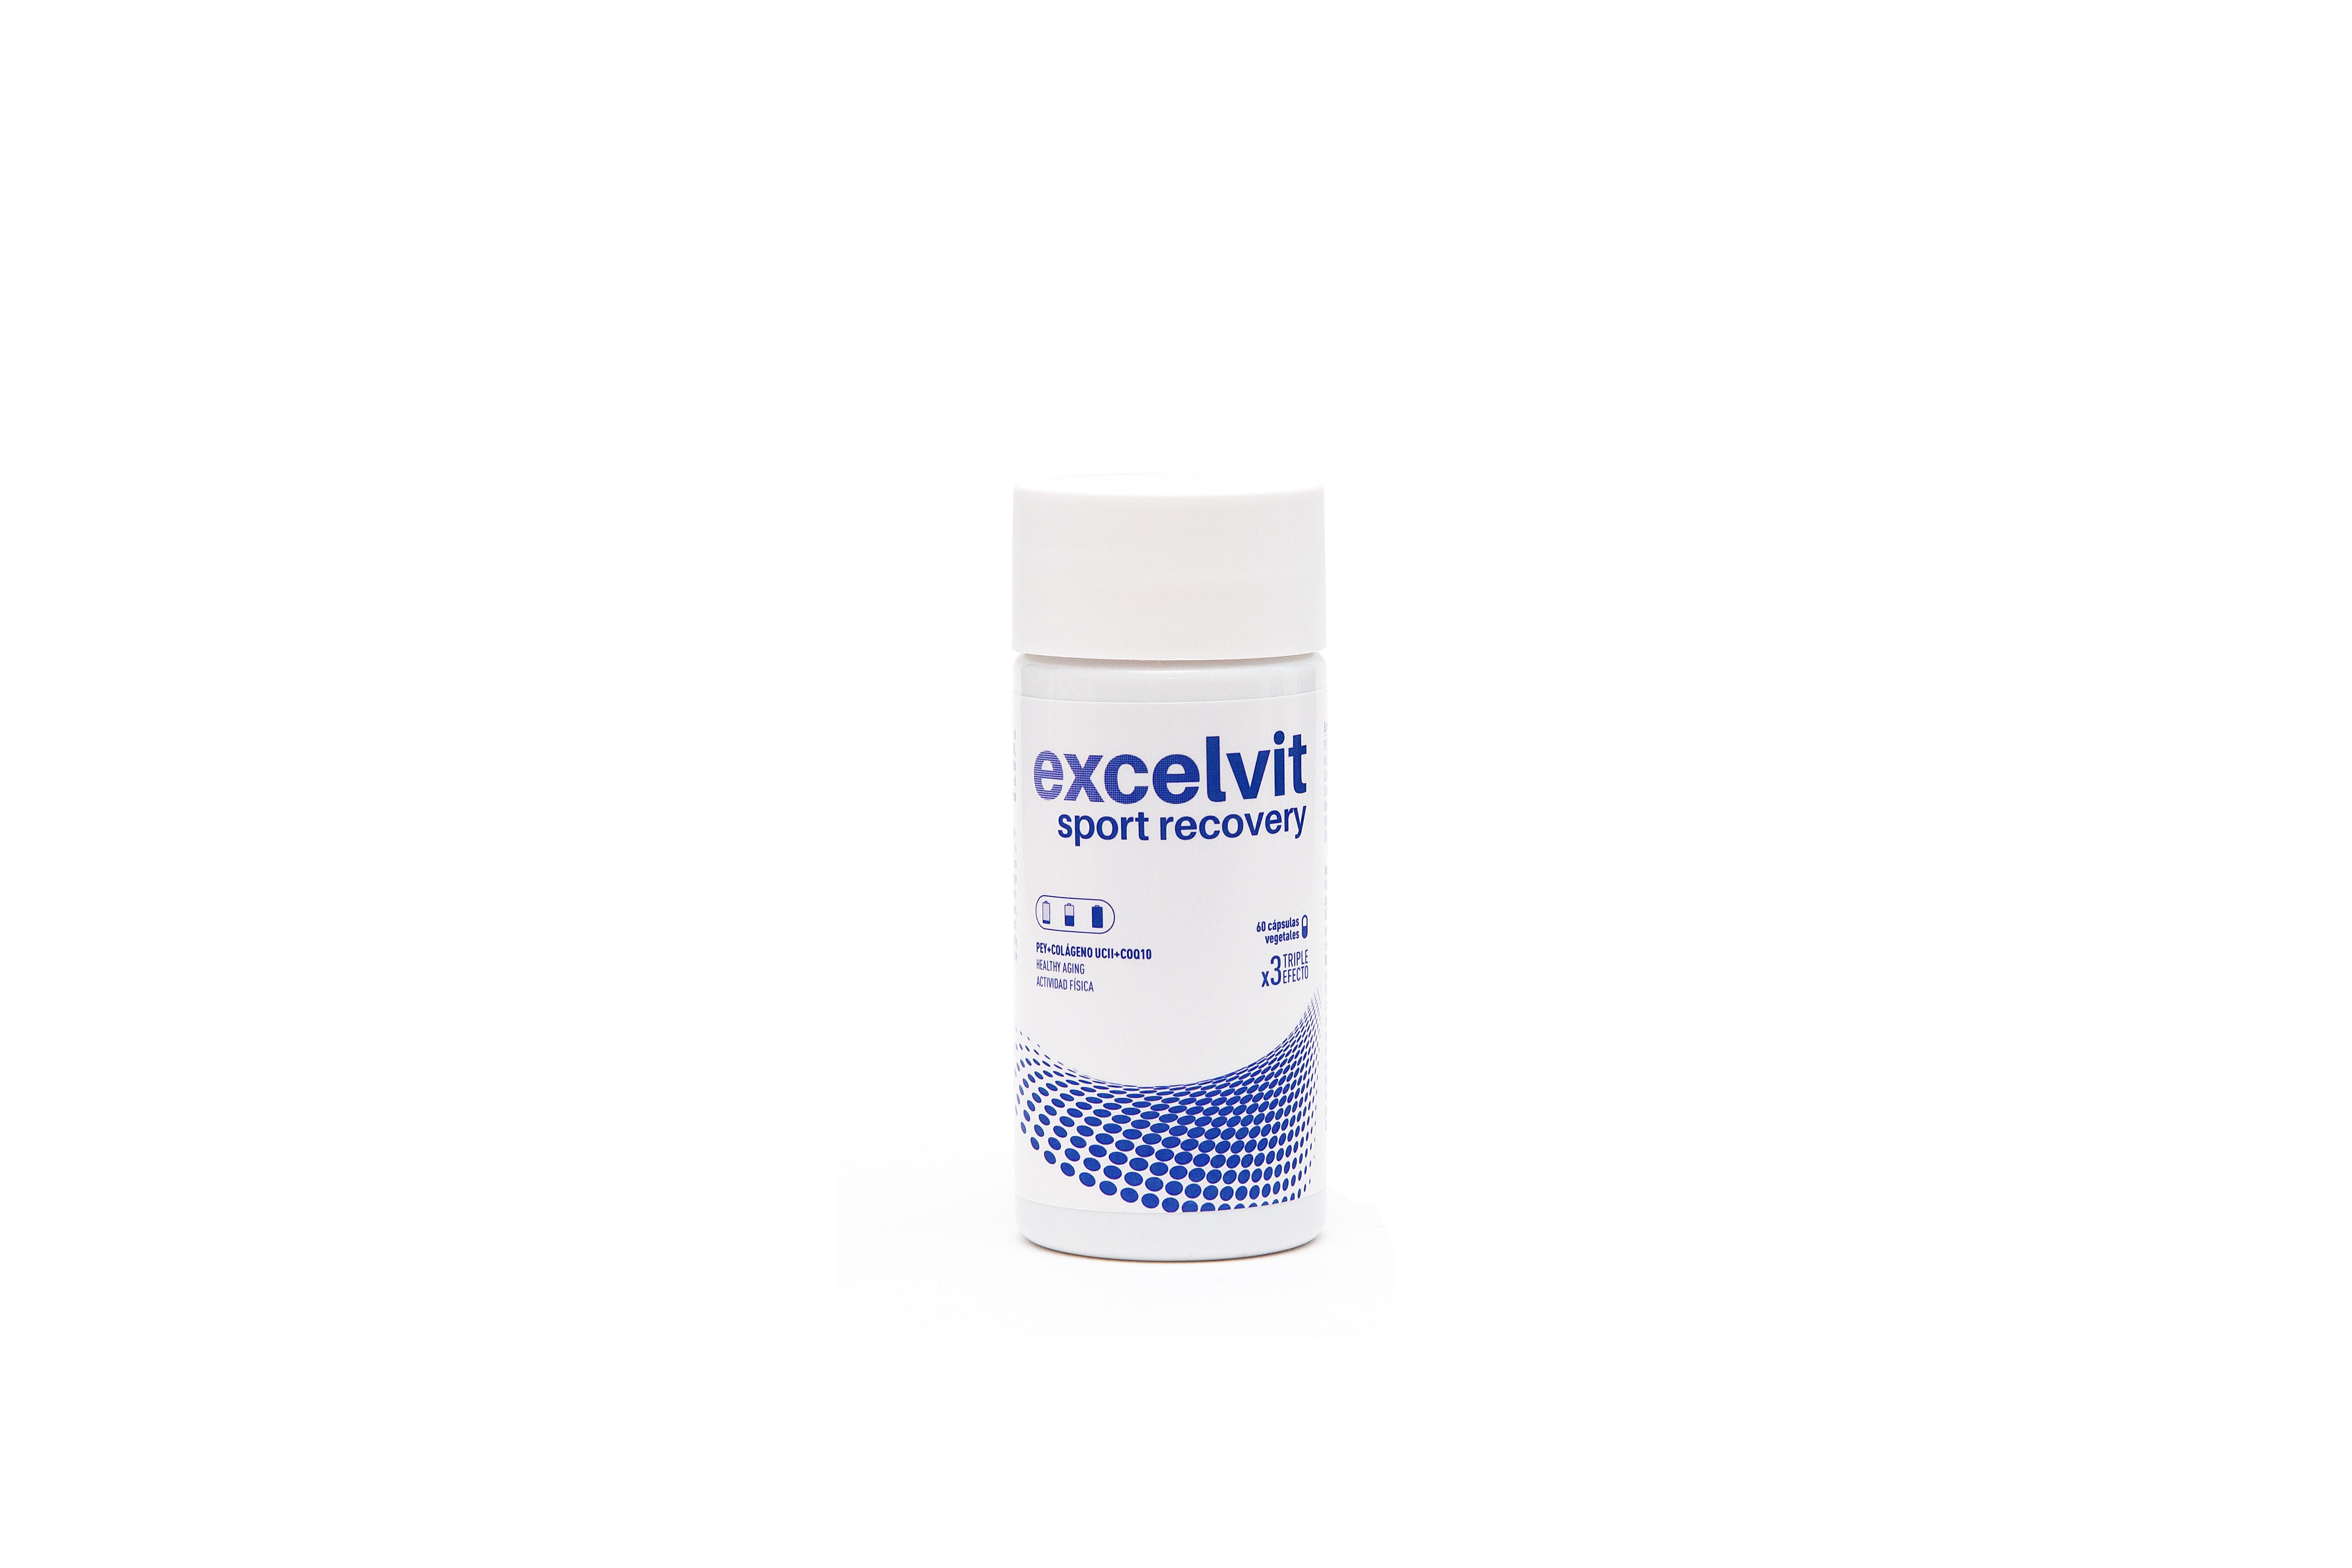 Excelvit_Sport